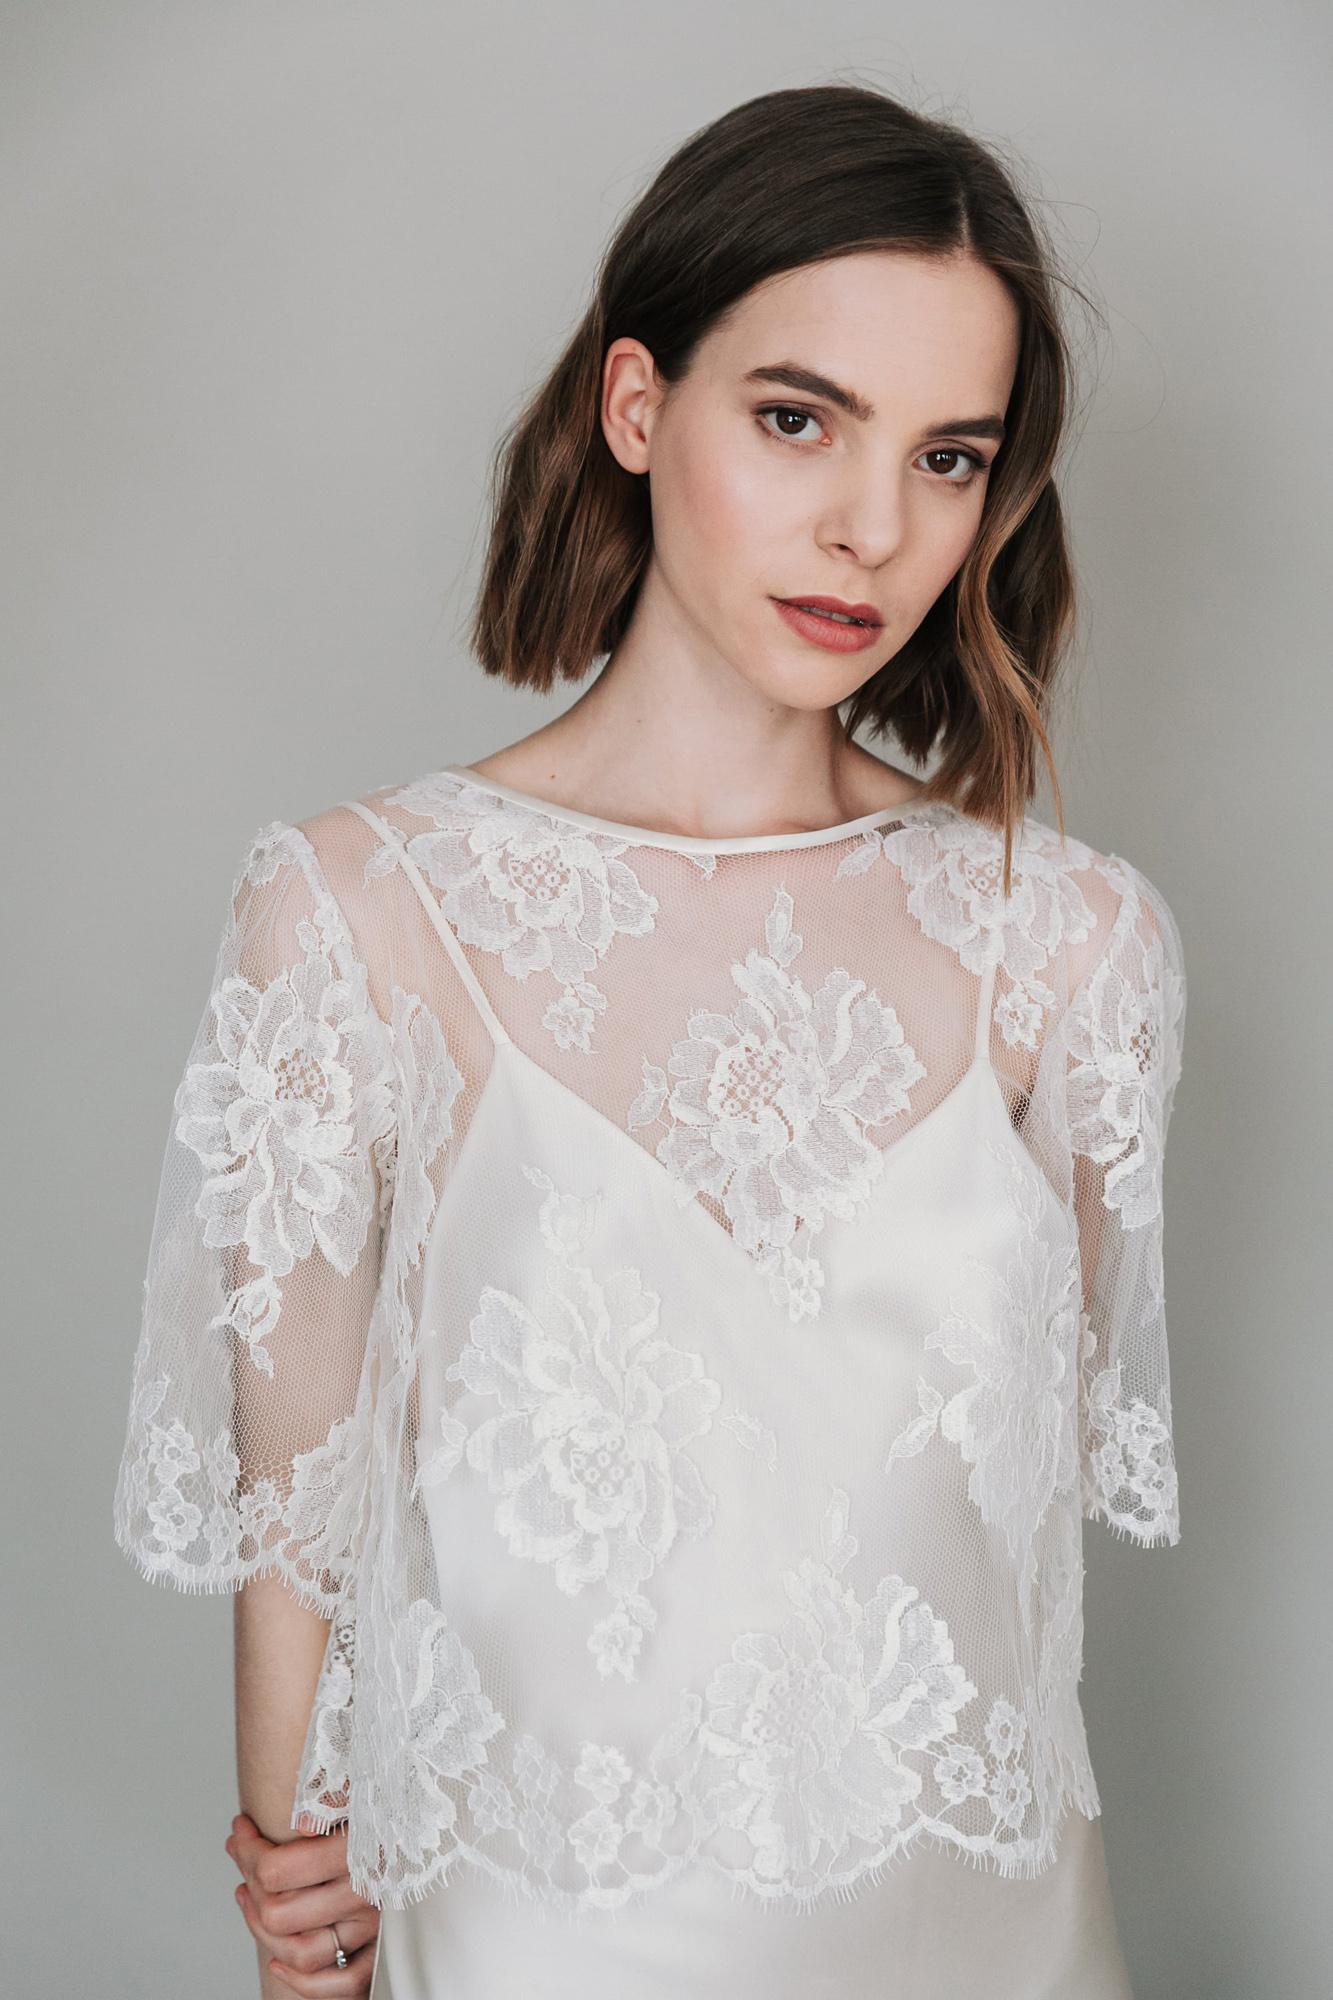 Kate-Beaumont-Sheffield-Rosa-Floral-Lace-Jacket-Camellia-Bias-Cut-Silk-Wedding-Gown-2.jpg